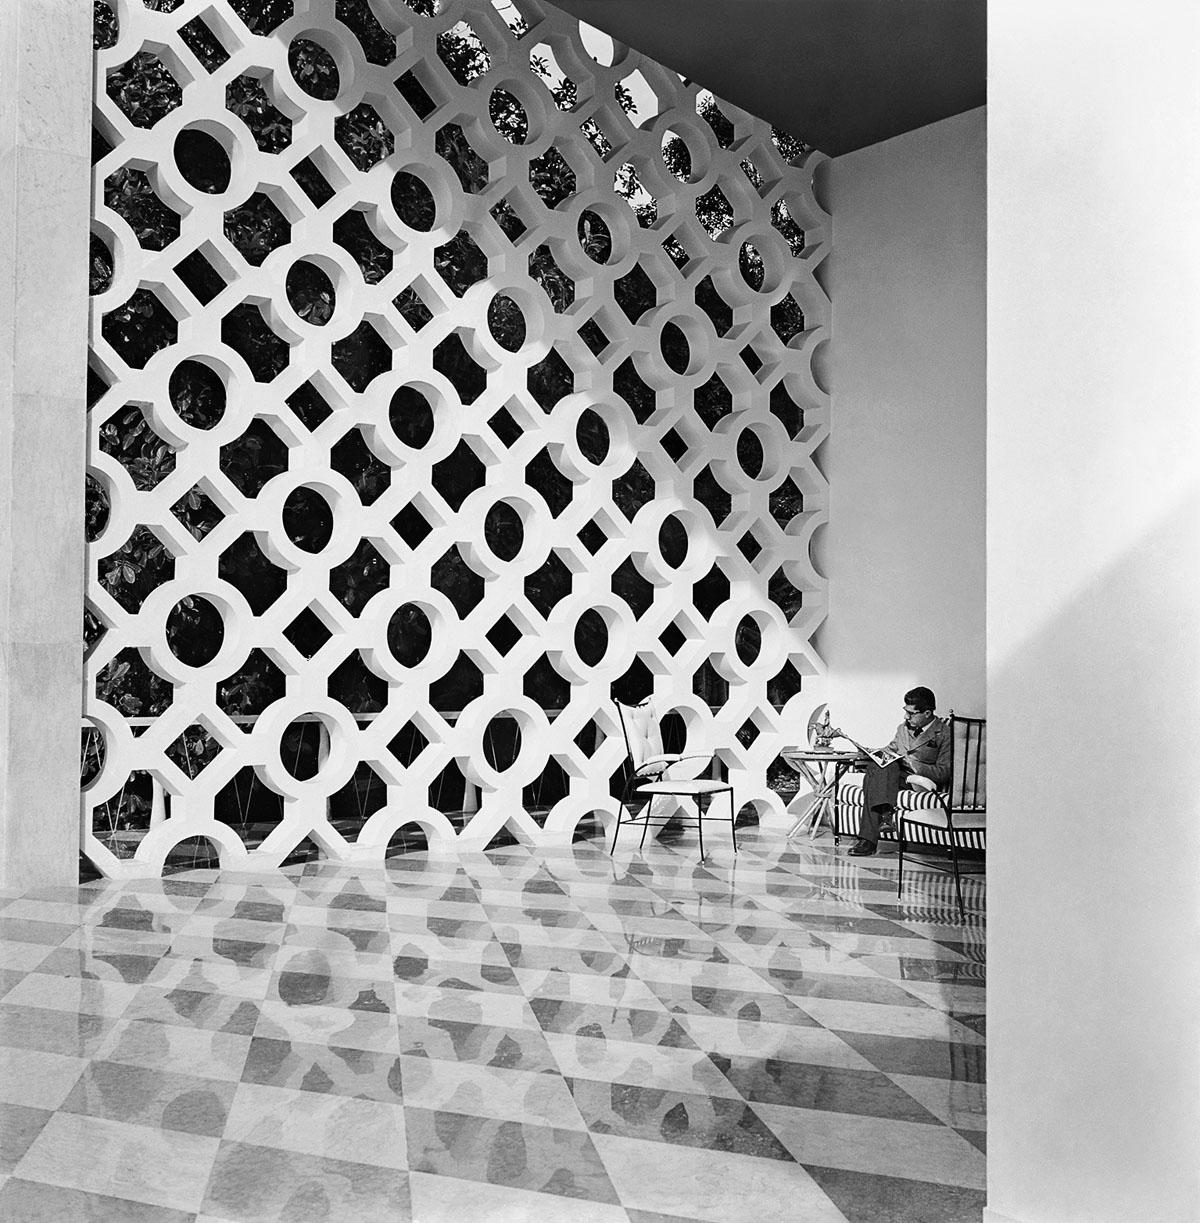 Olavo Redig de Campos na residência de Walther Moreira Salles, c. 1954. Foto de Marcel Gautherot / Acervo IMS